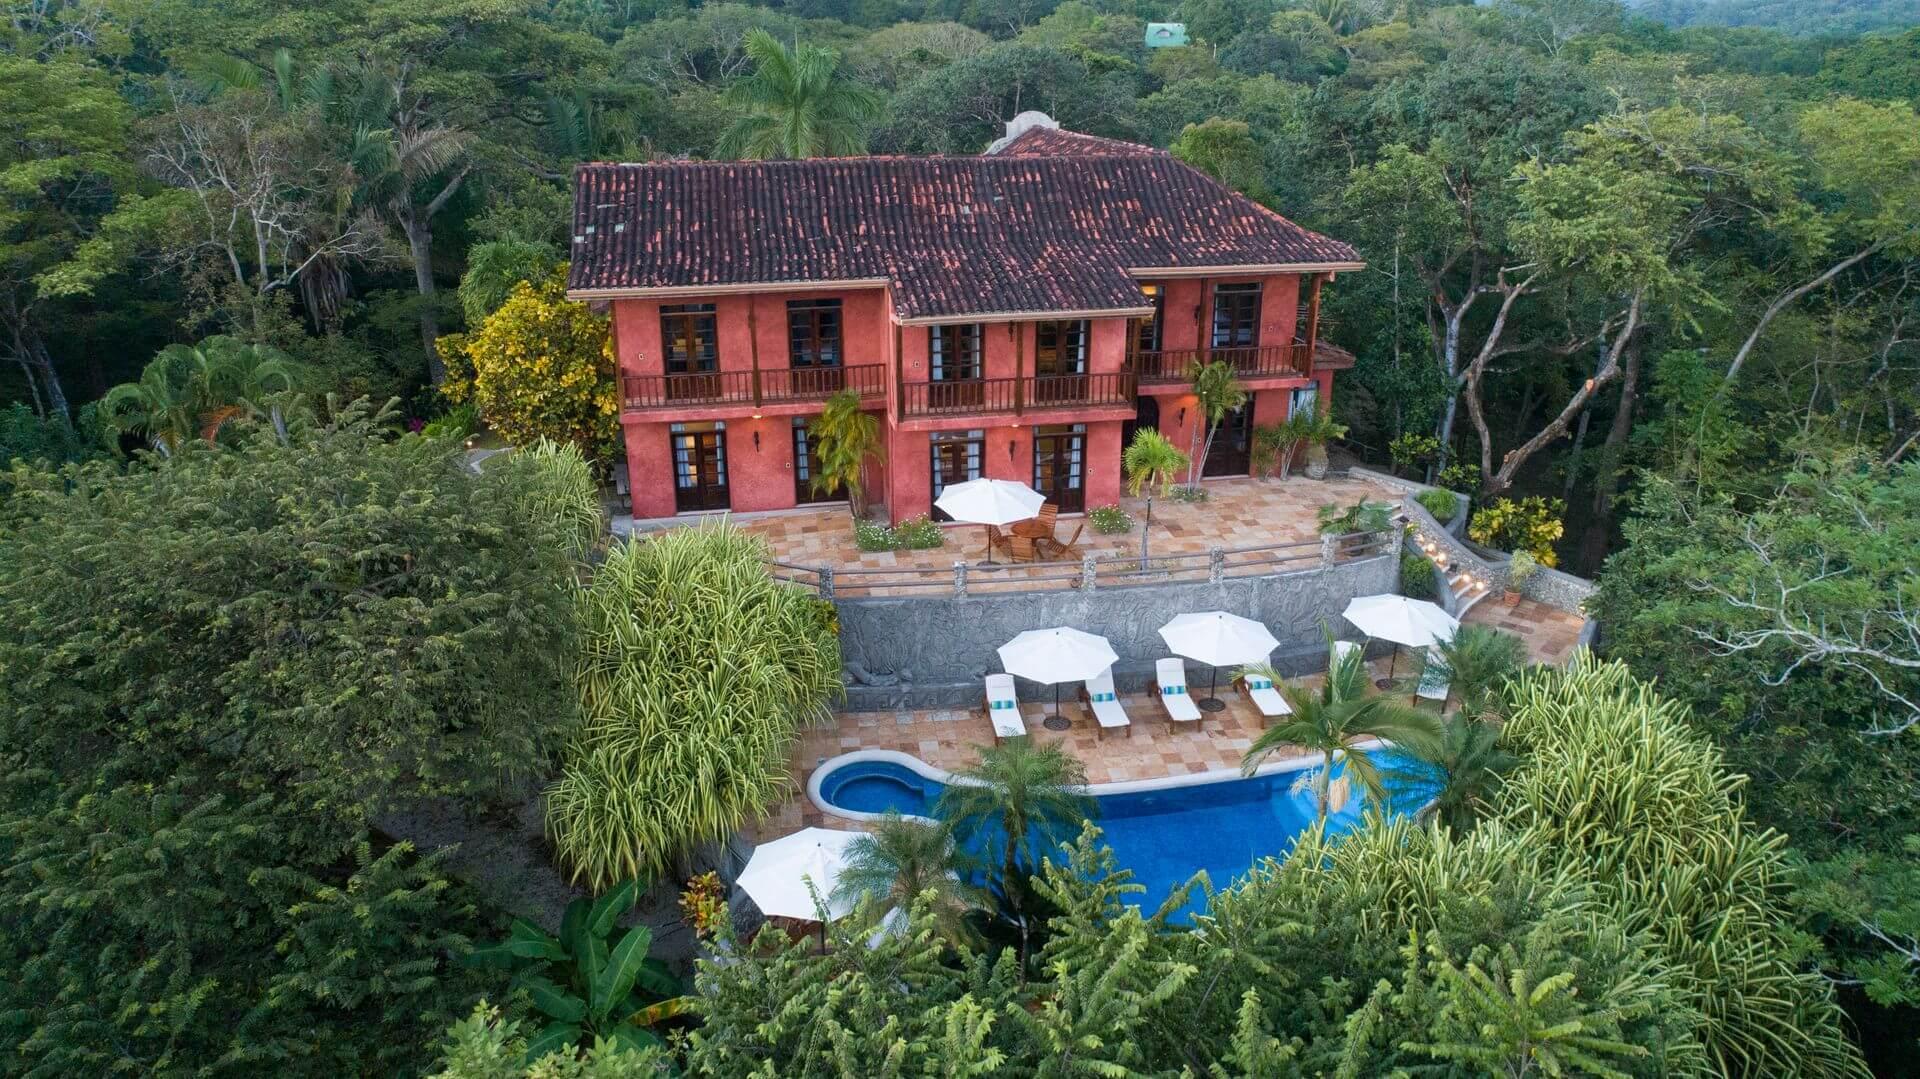 Casa Barrigona Poolside View